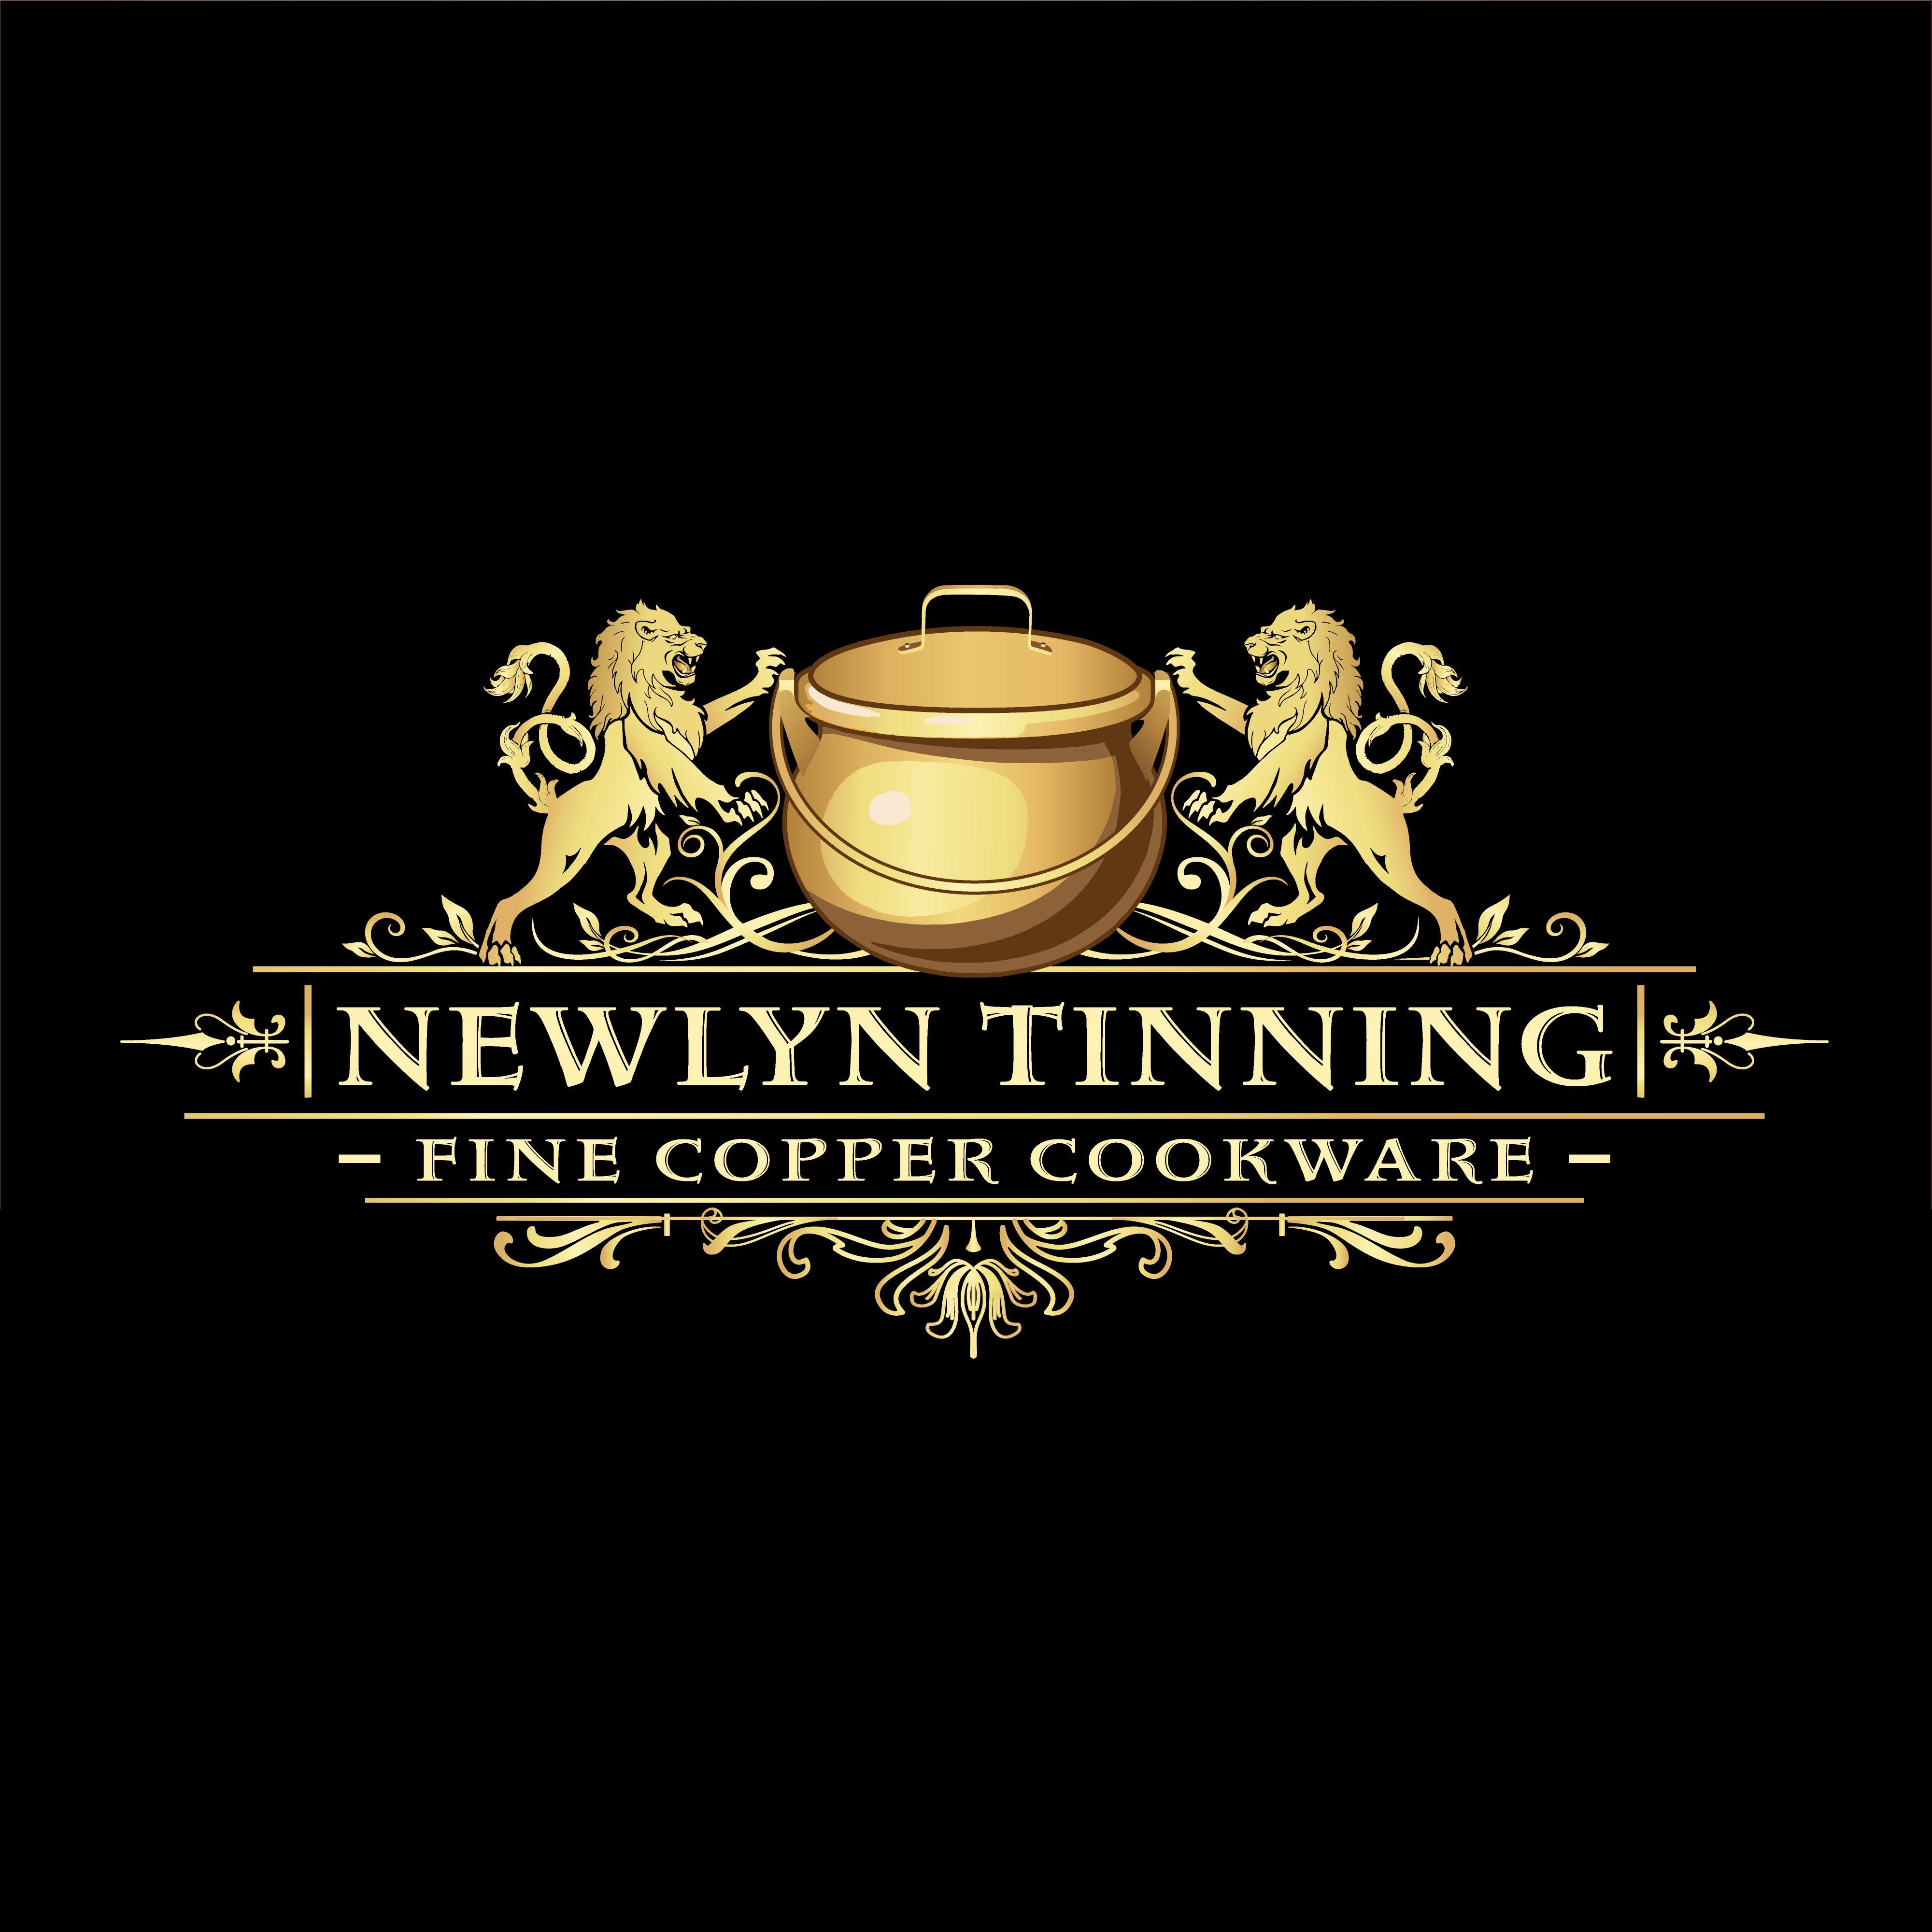 Newlyn Tinning